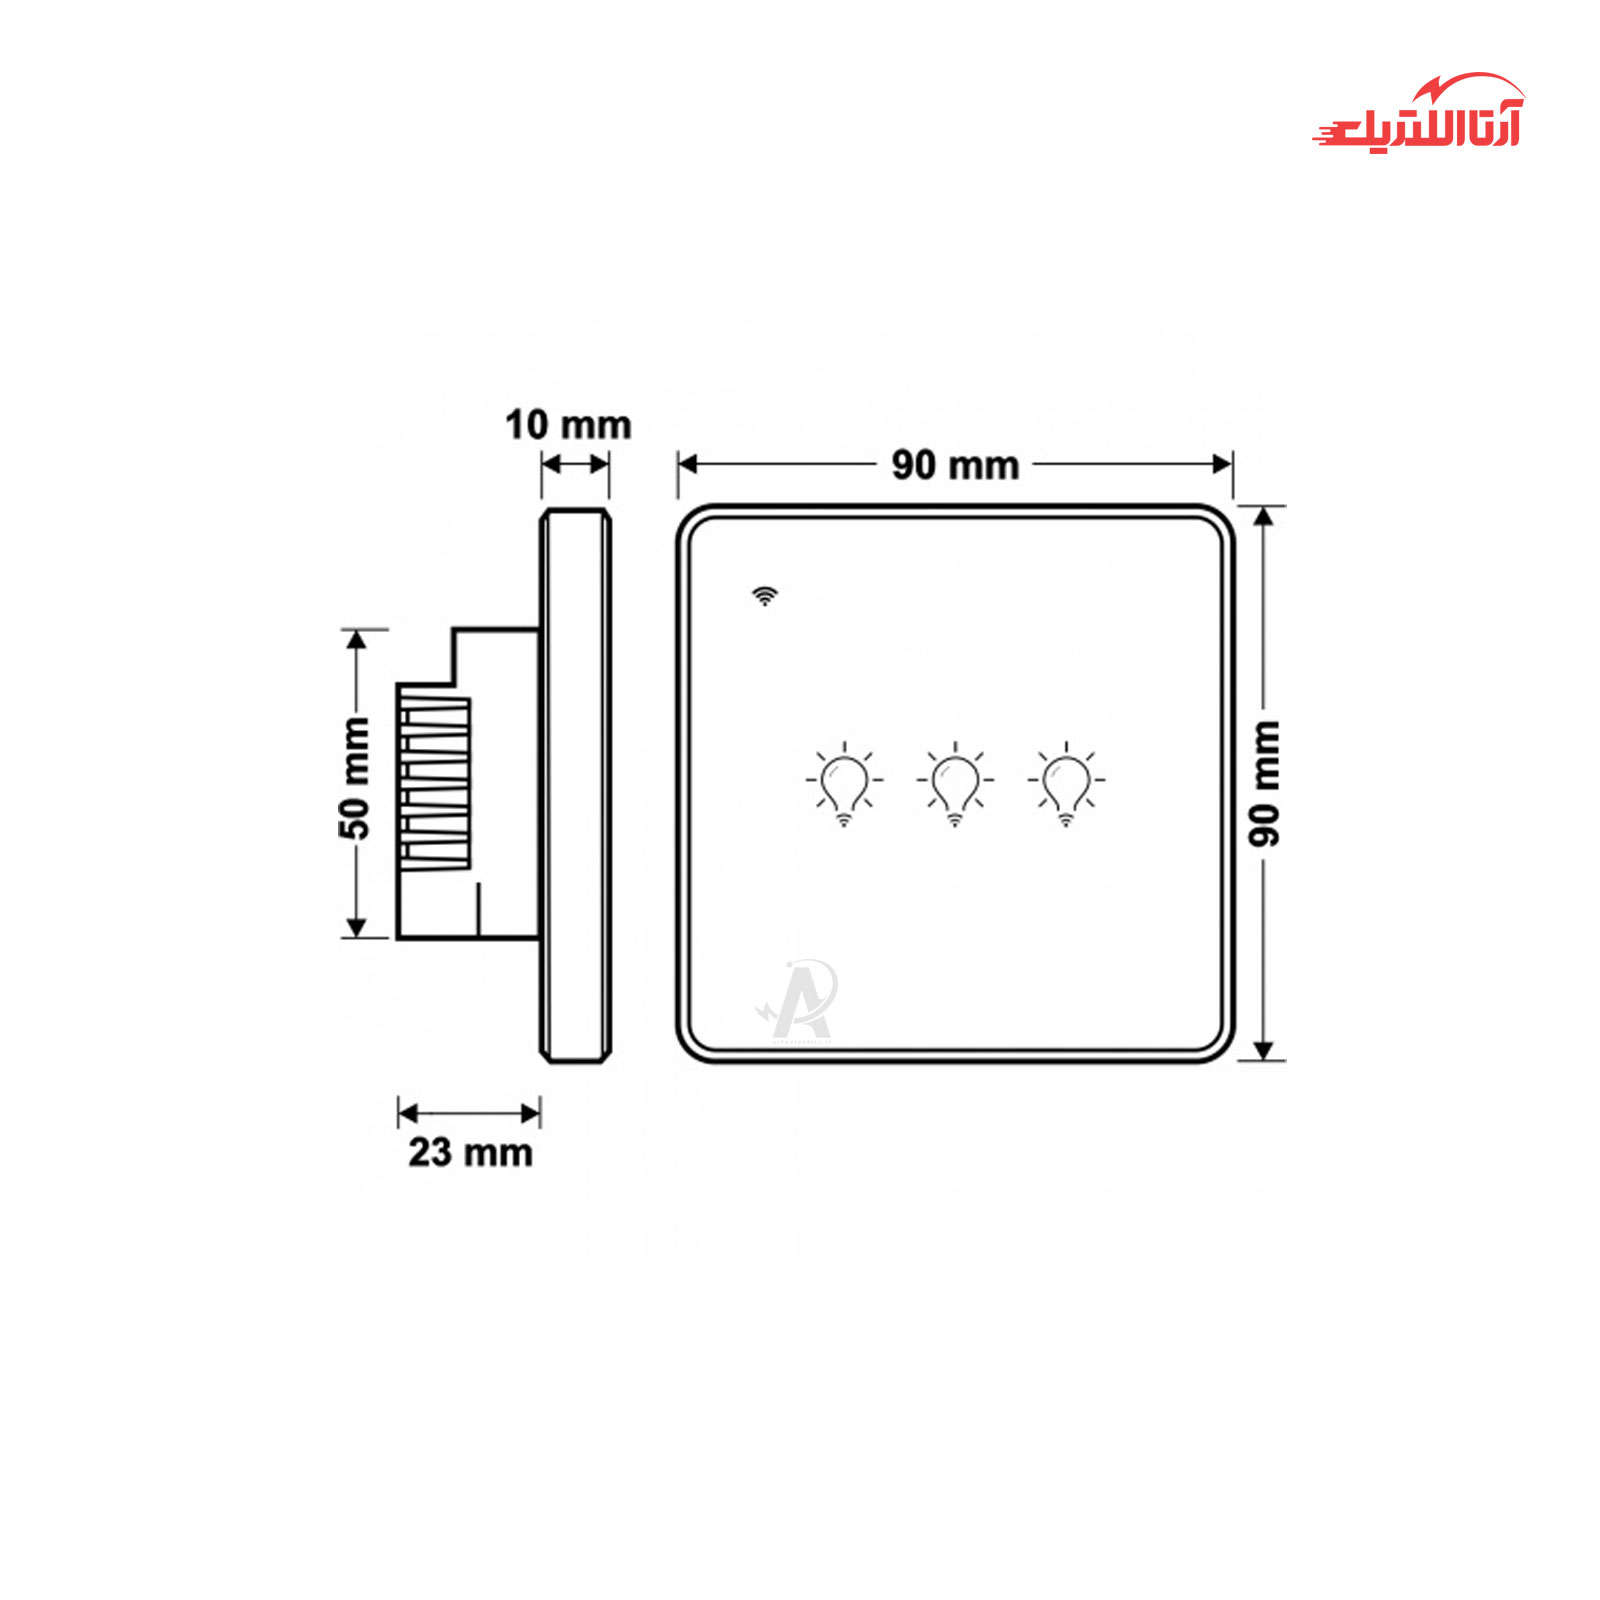 کلید لمسی سه پل هوشمند فاین الکتریک مدل FEC-SW-03